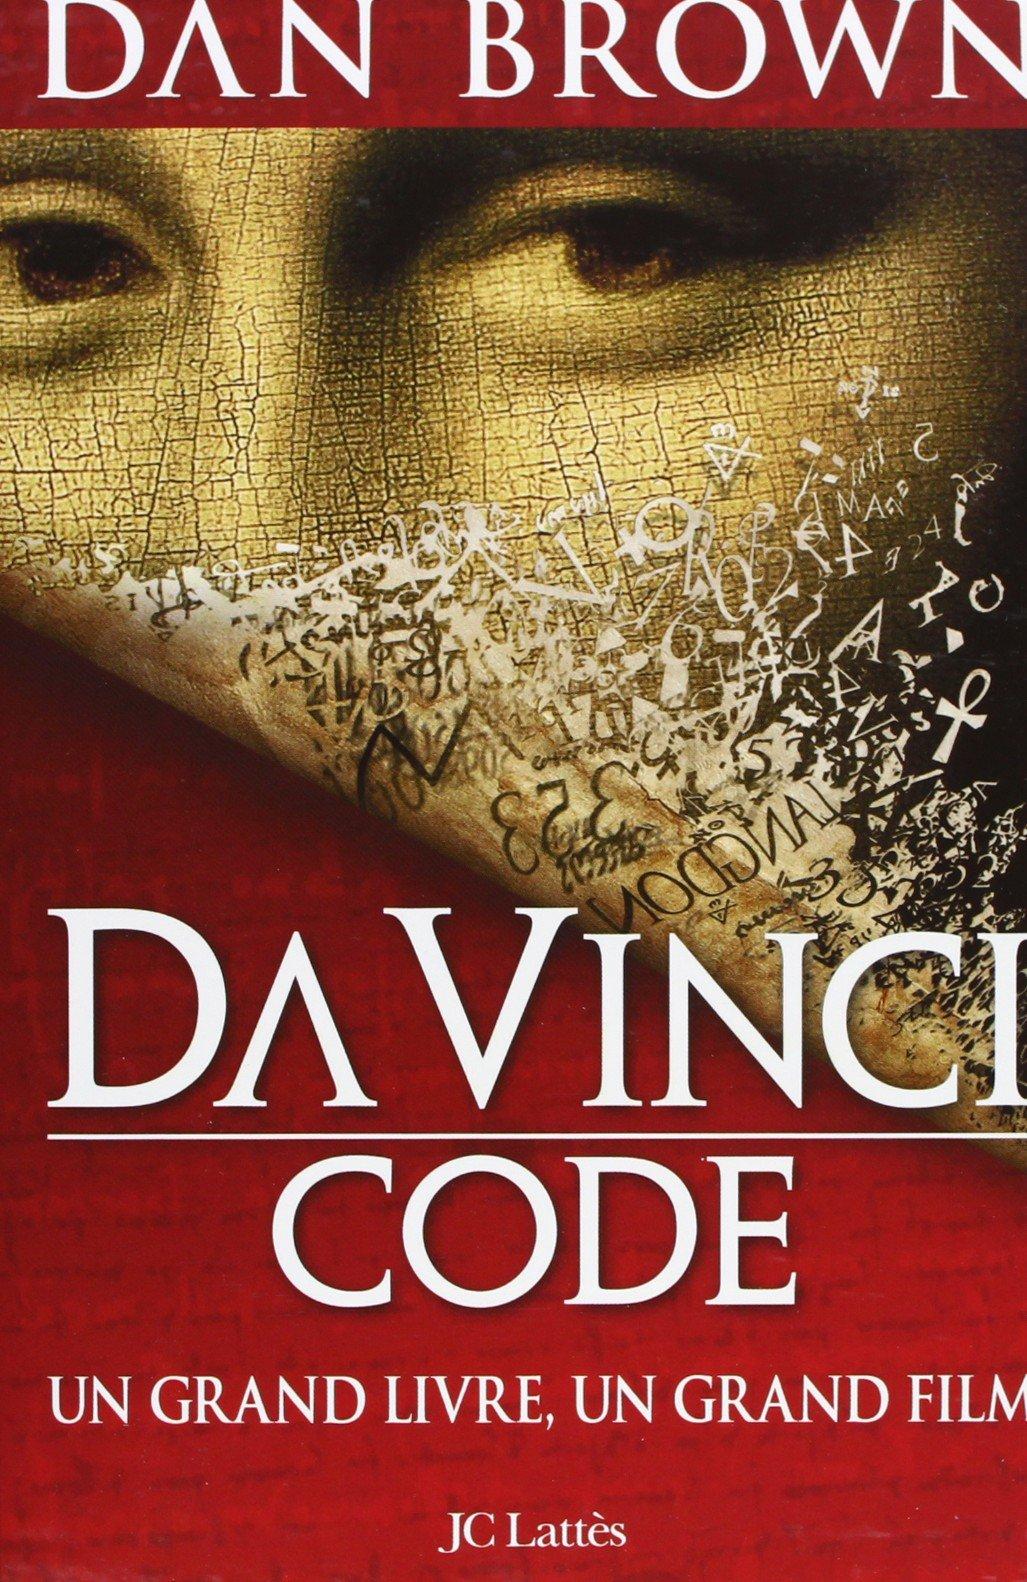 the da vinci code book review essay